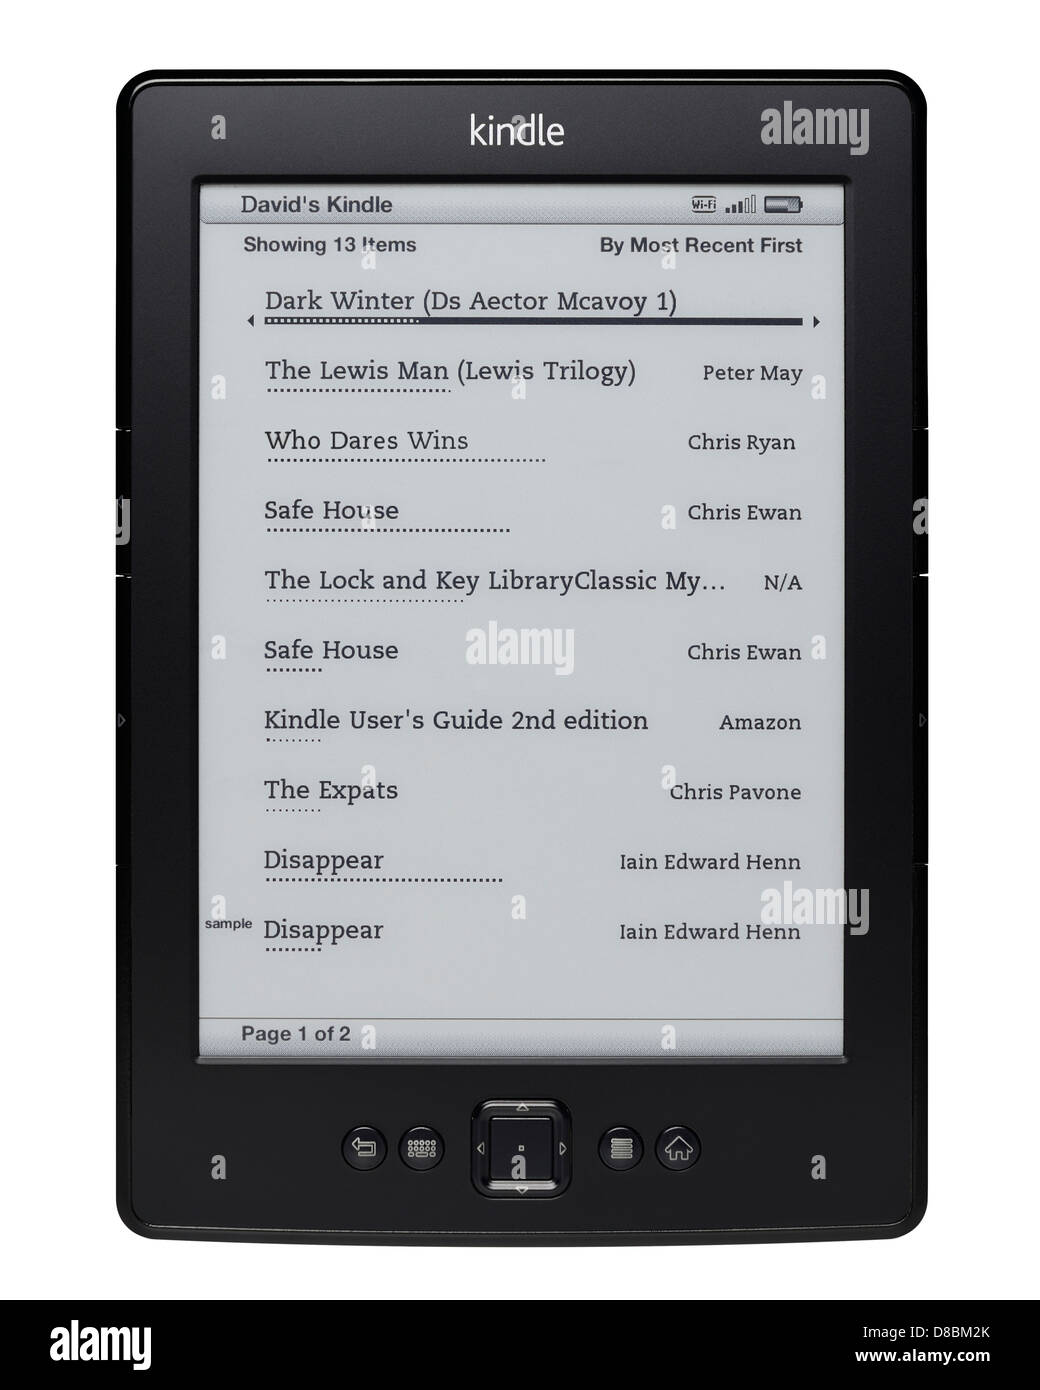 Kindle E Ink eReader Reading Device Stock Photo: 56805579